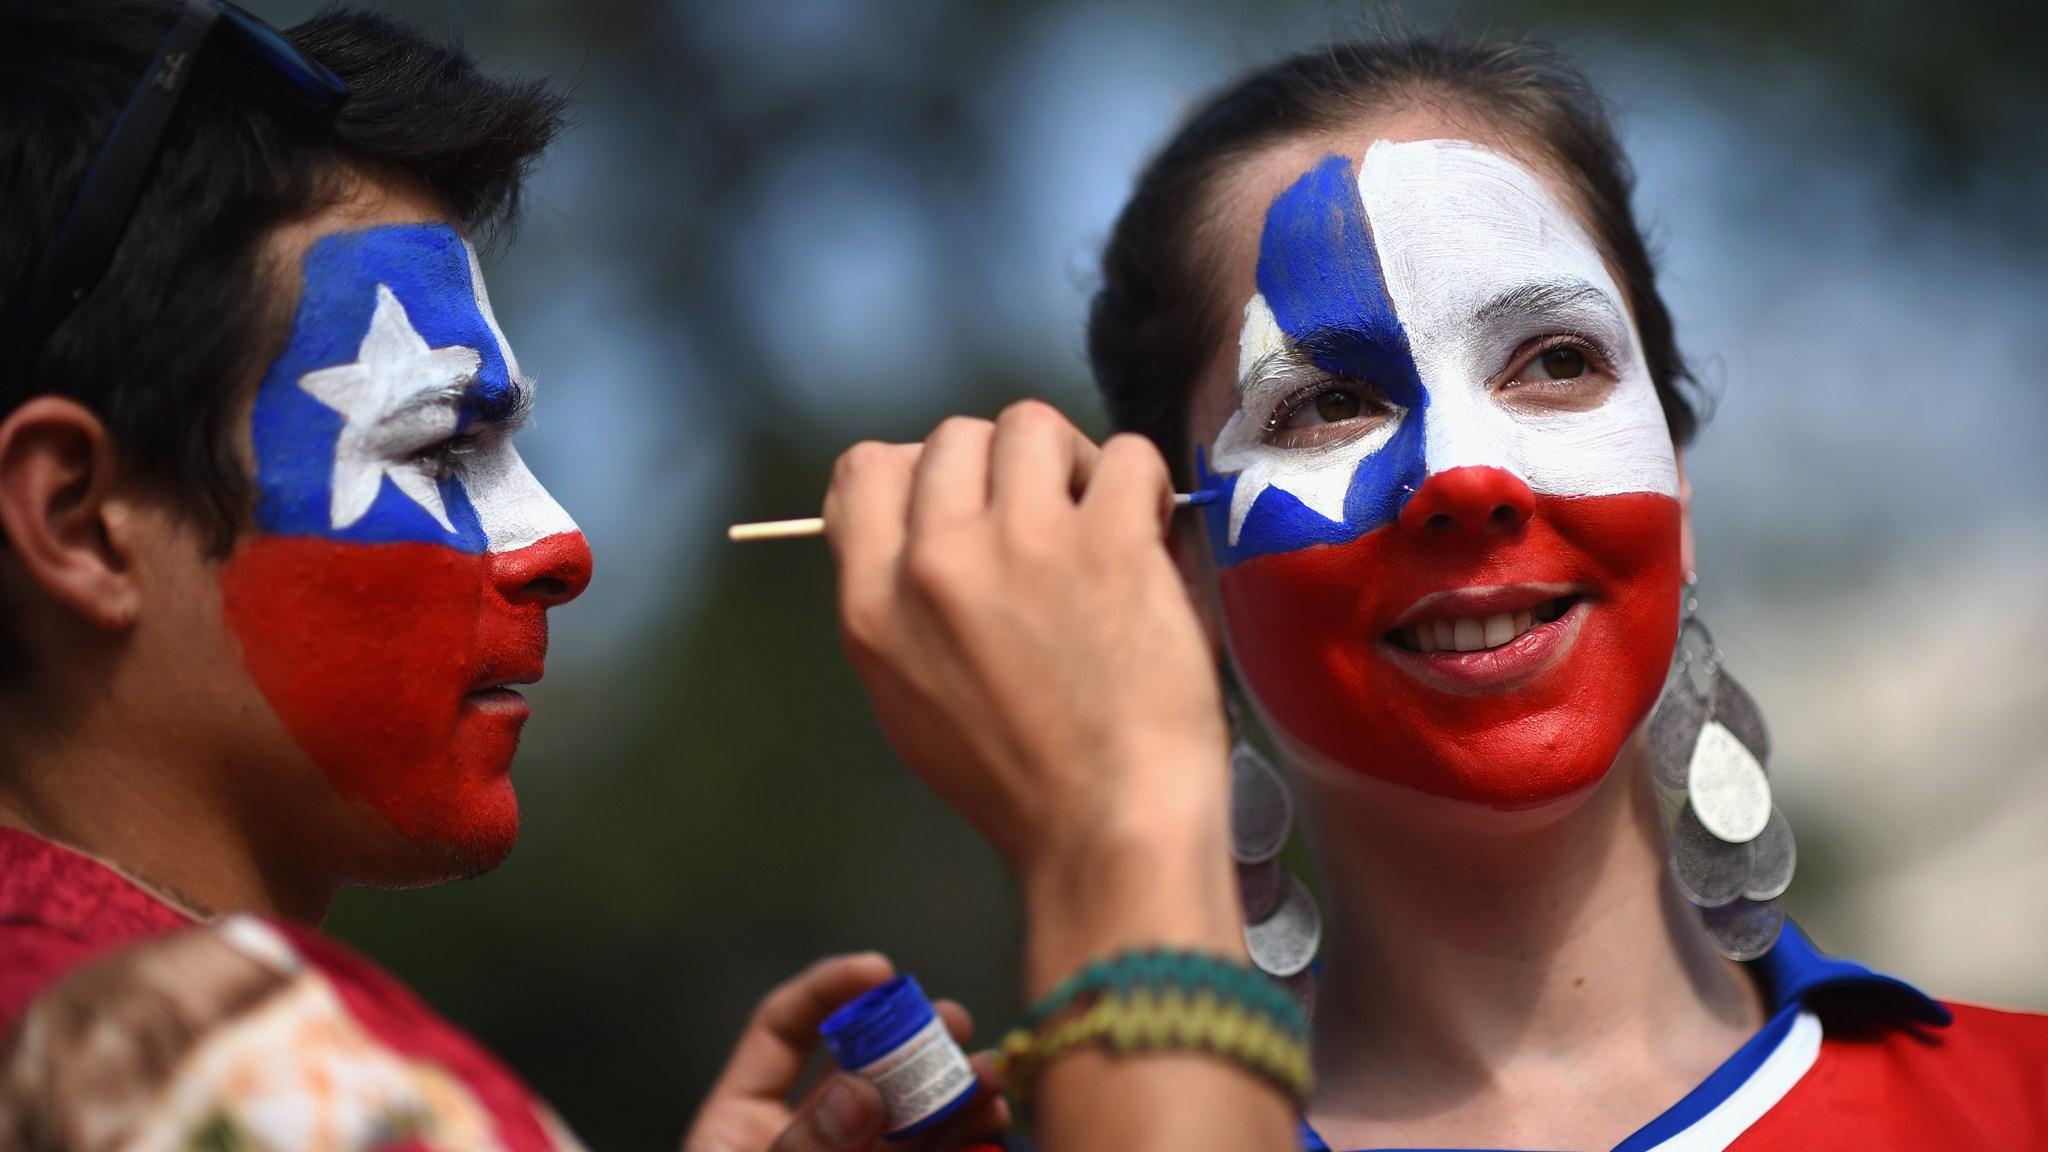 195 - Spain-Chile [0-2] -- 18 Jun 2014 - 16-00 -- rio_de_janeiro_maracana_estadio_jornalista_mario_ - kuaza